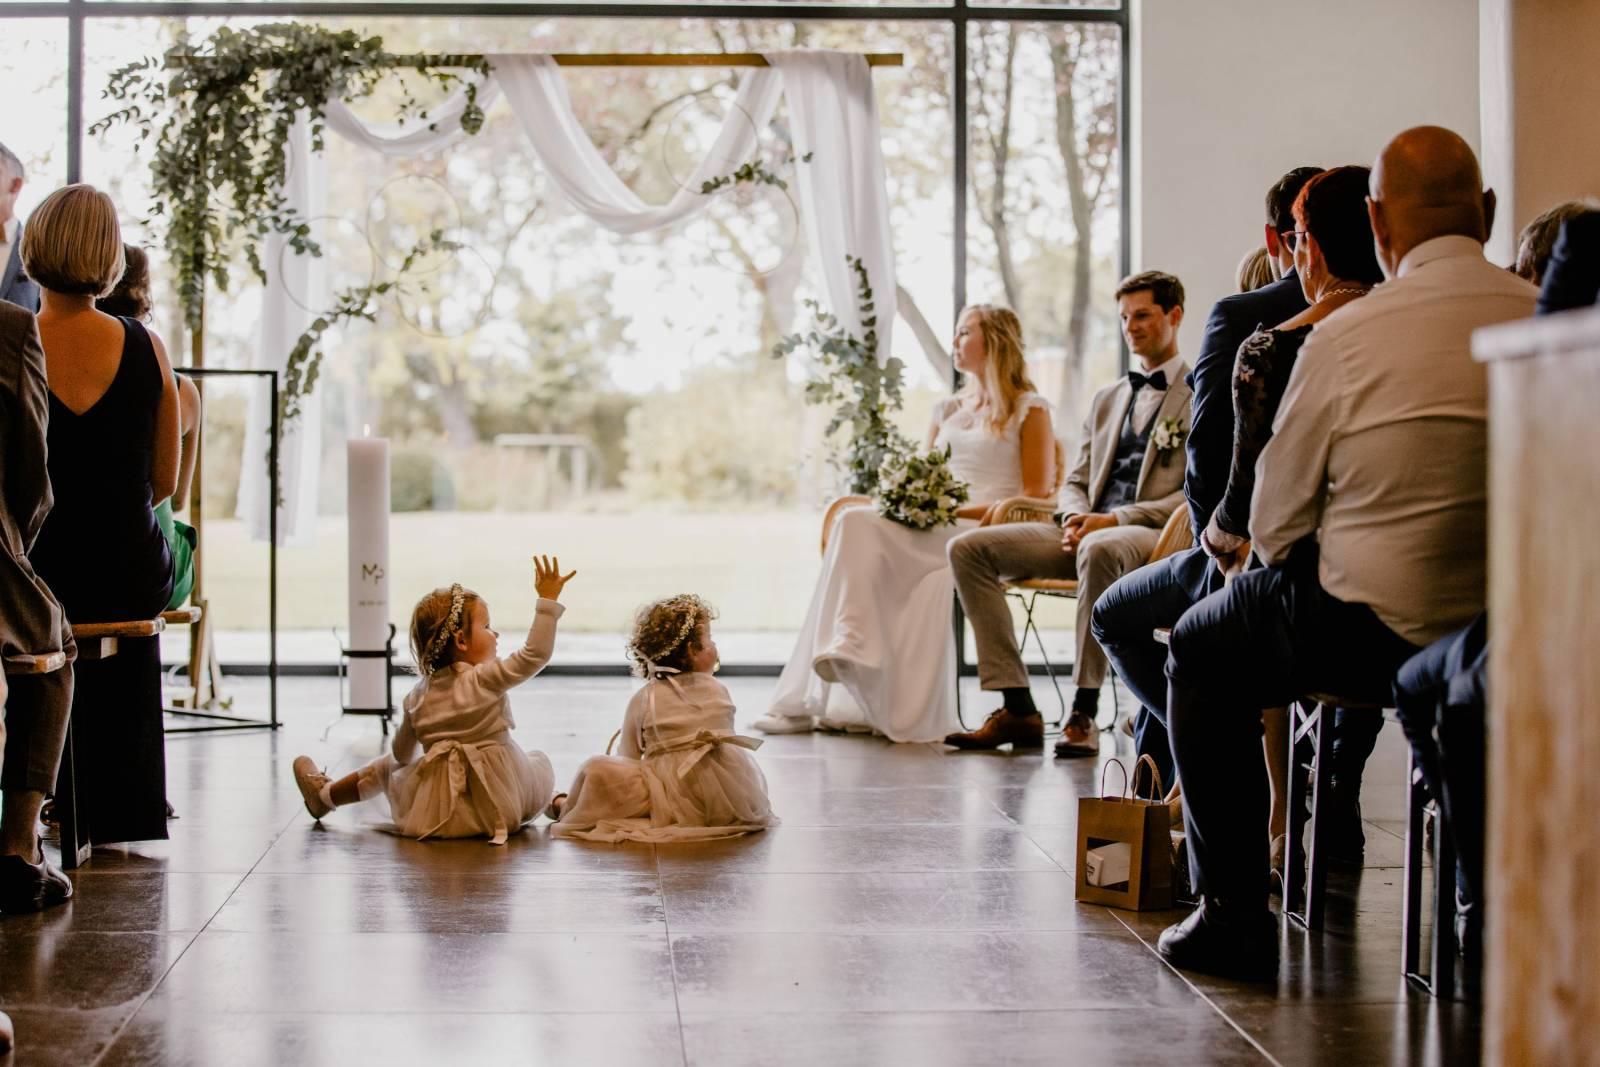 Live 4 Love - Ceremoniespreker - House of Weddings - 20